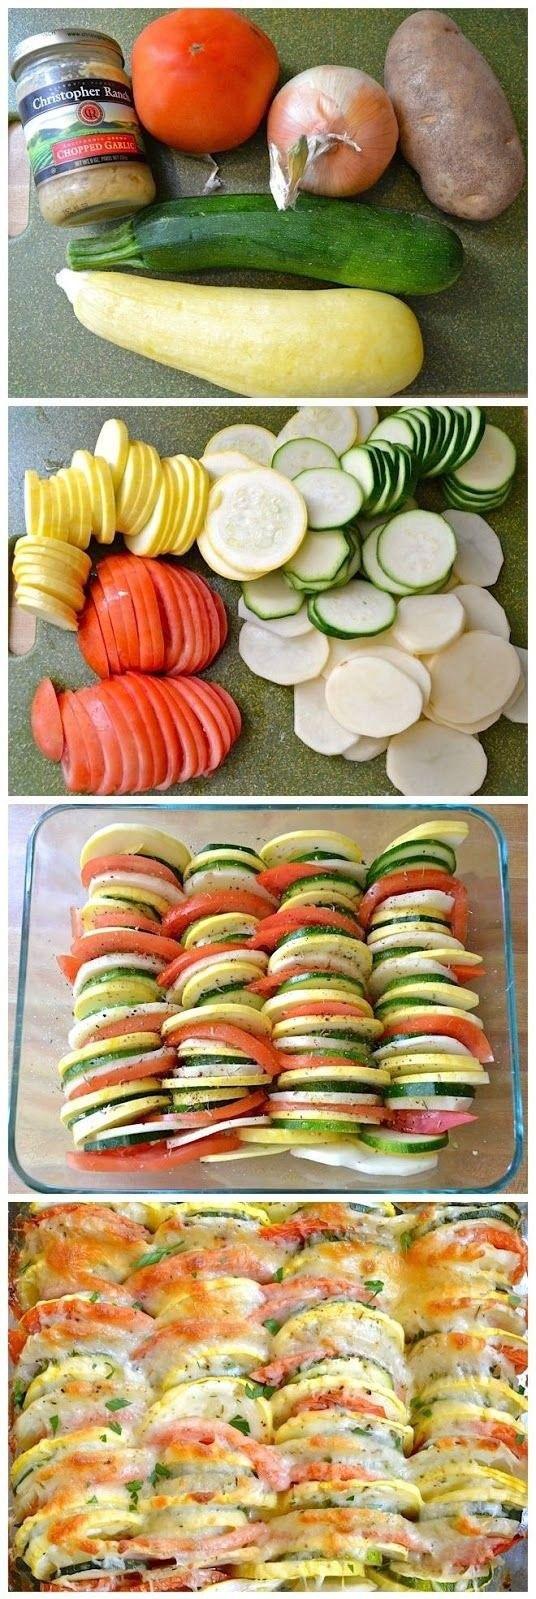 Easy vegetable dish